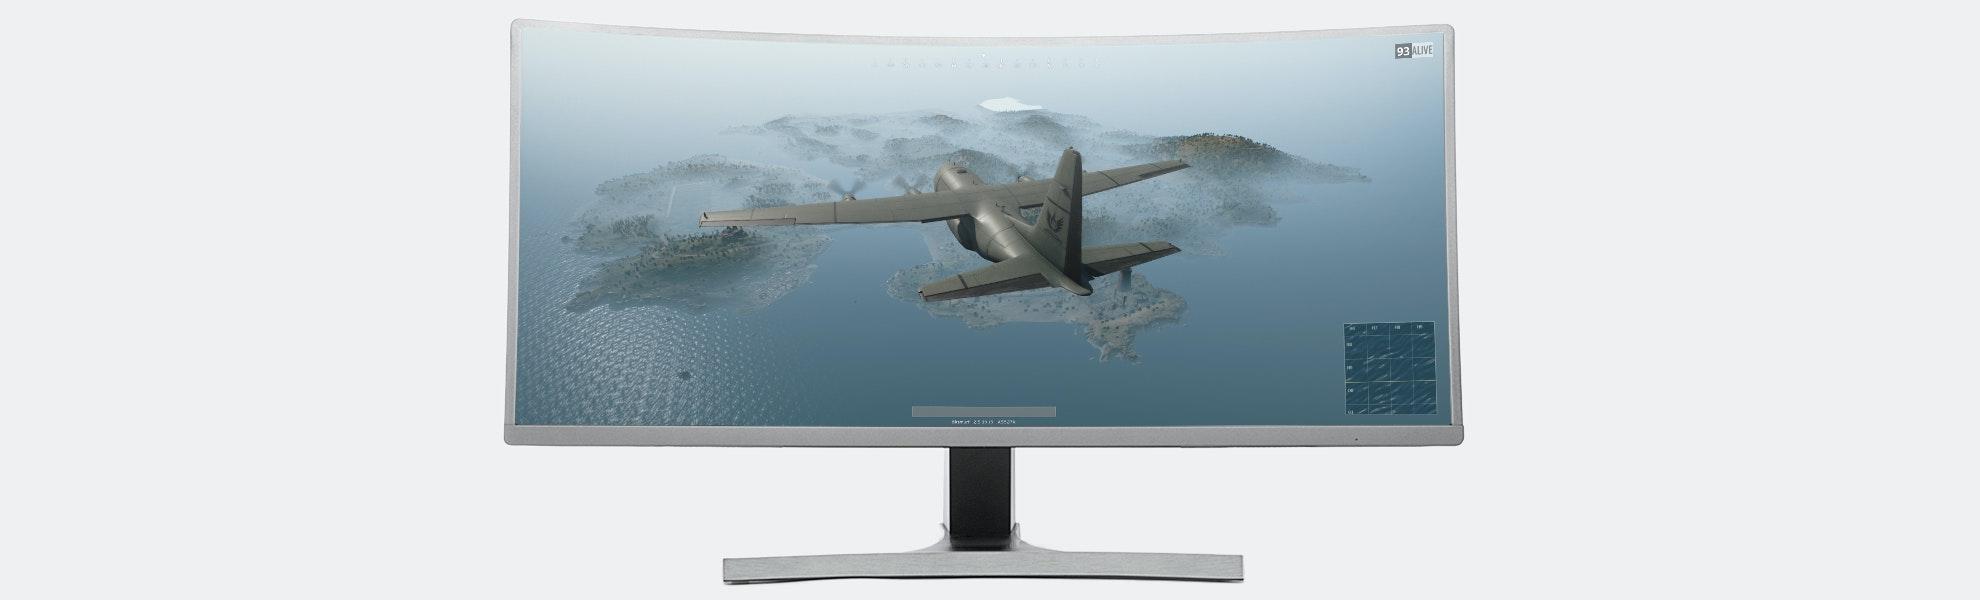 Massdrop Vast 35-Inch Curved Gaming Monitor